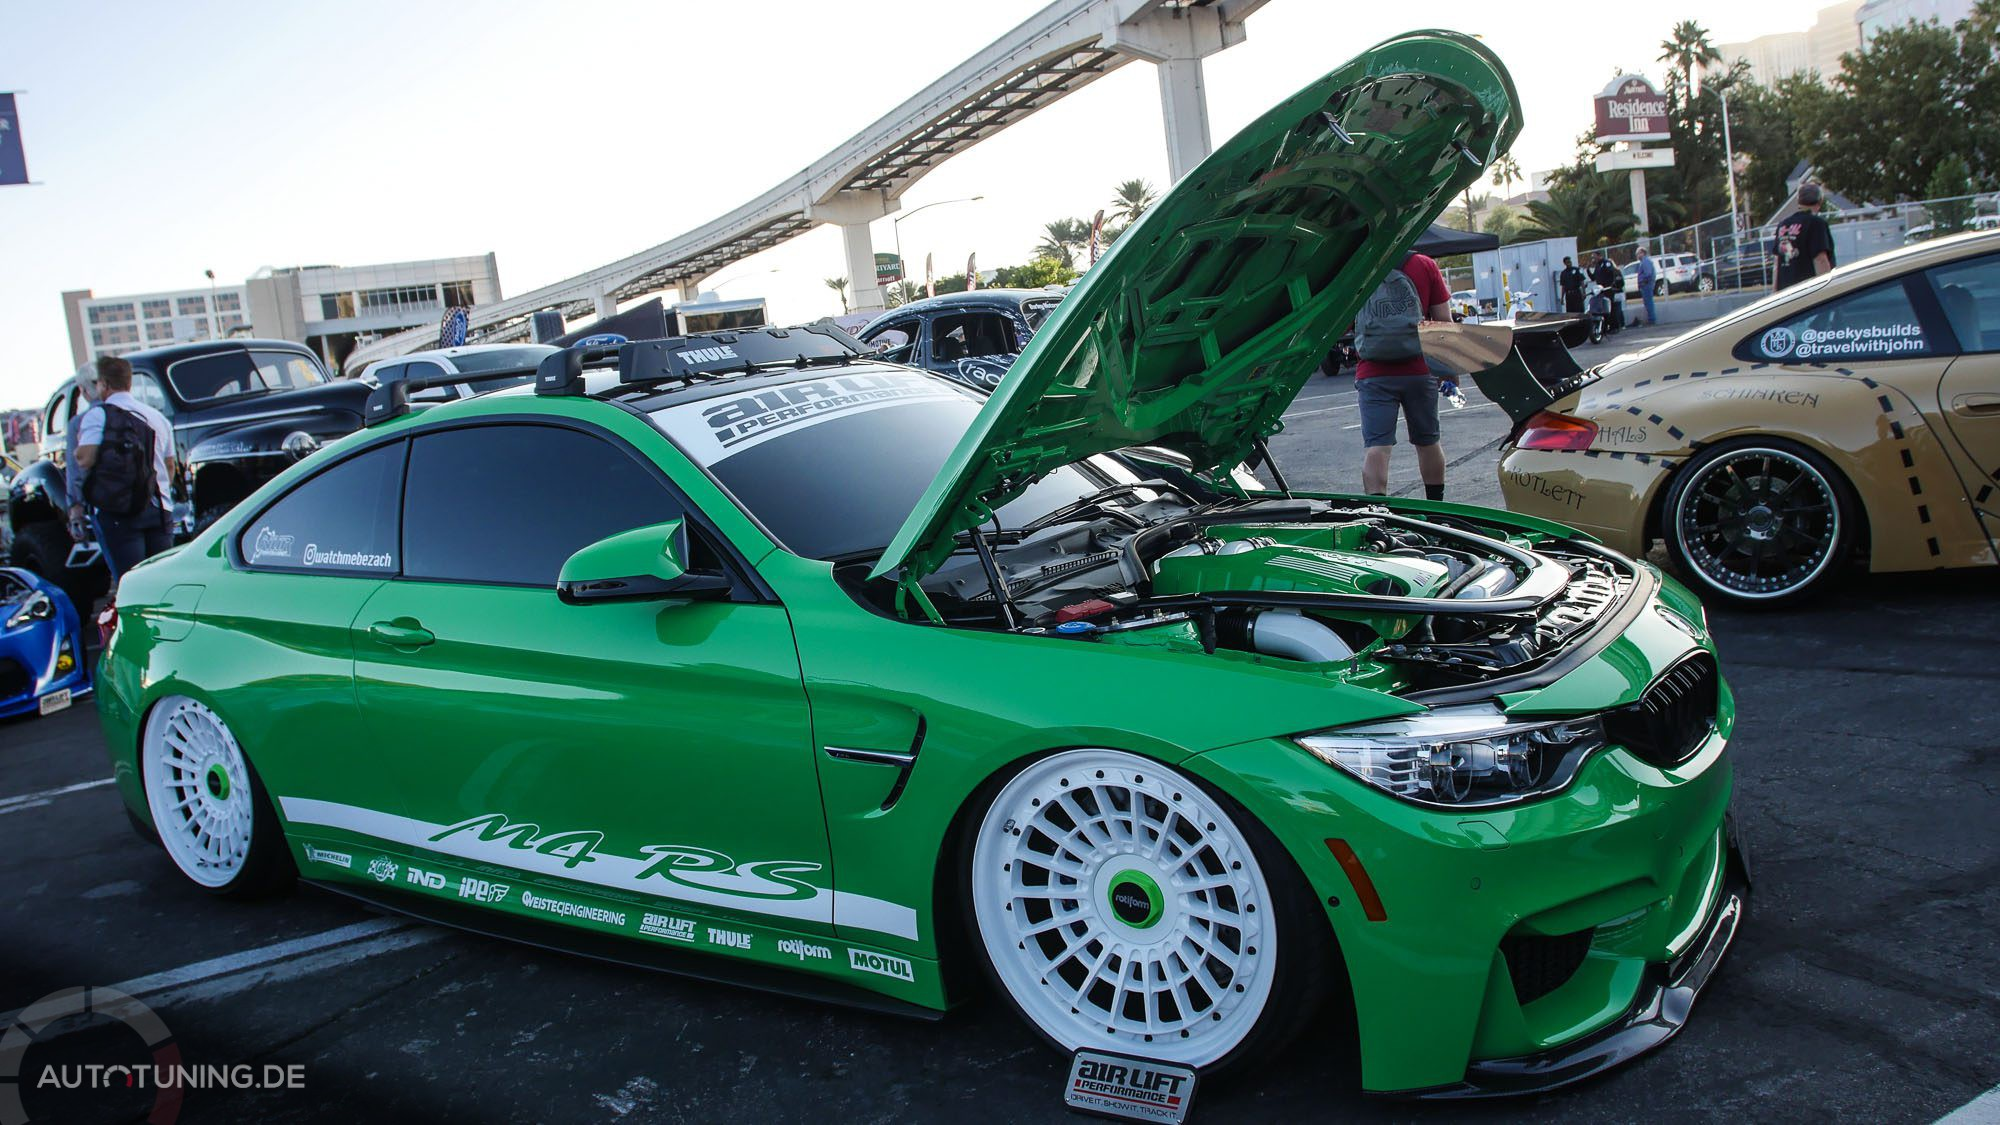 Giftgrünes, getuntes Auto mit offener Motorhaube